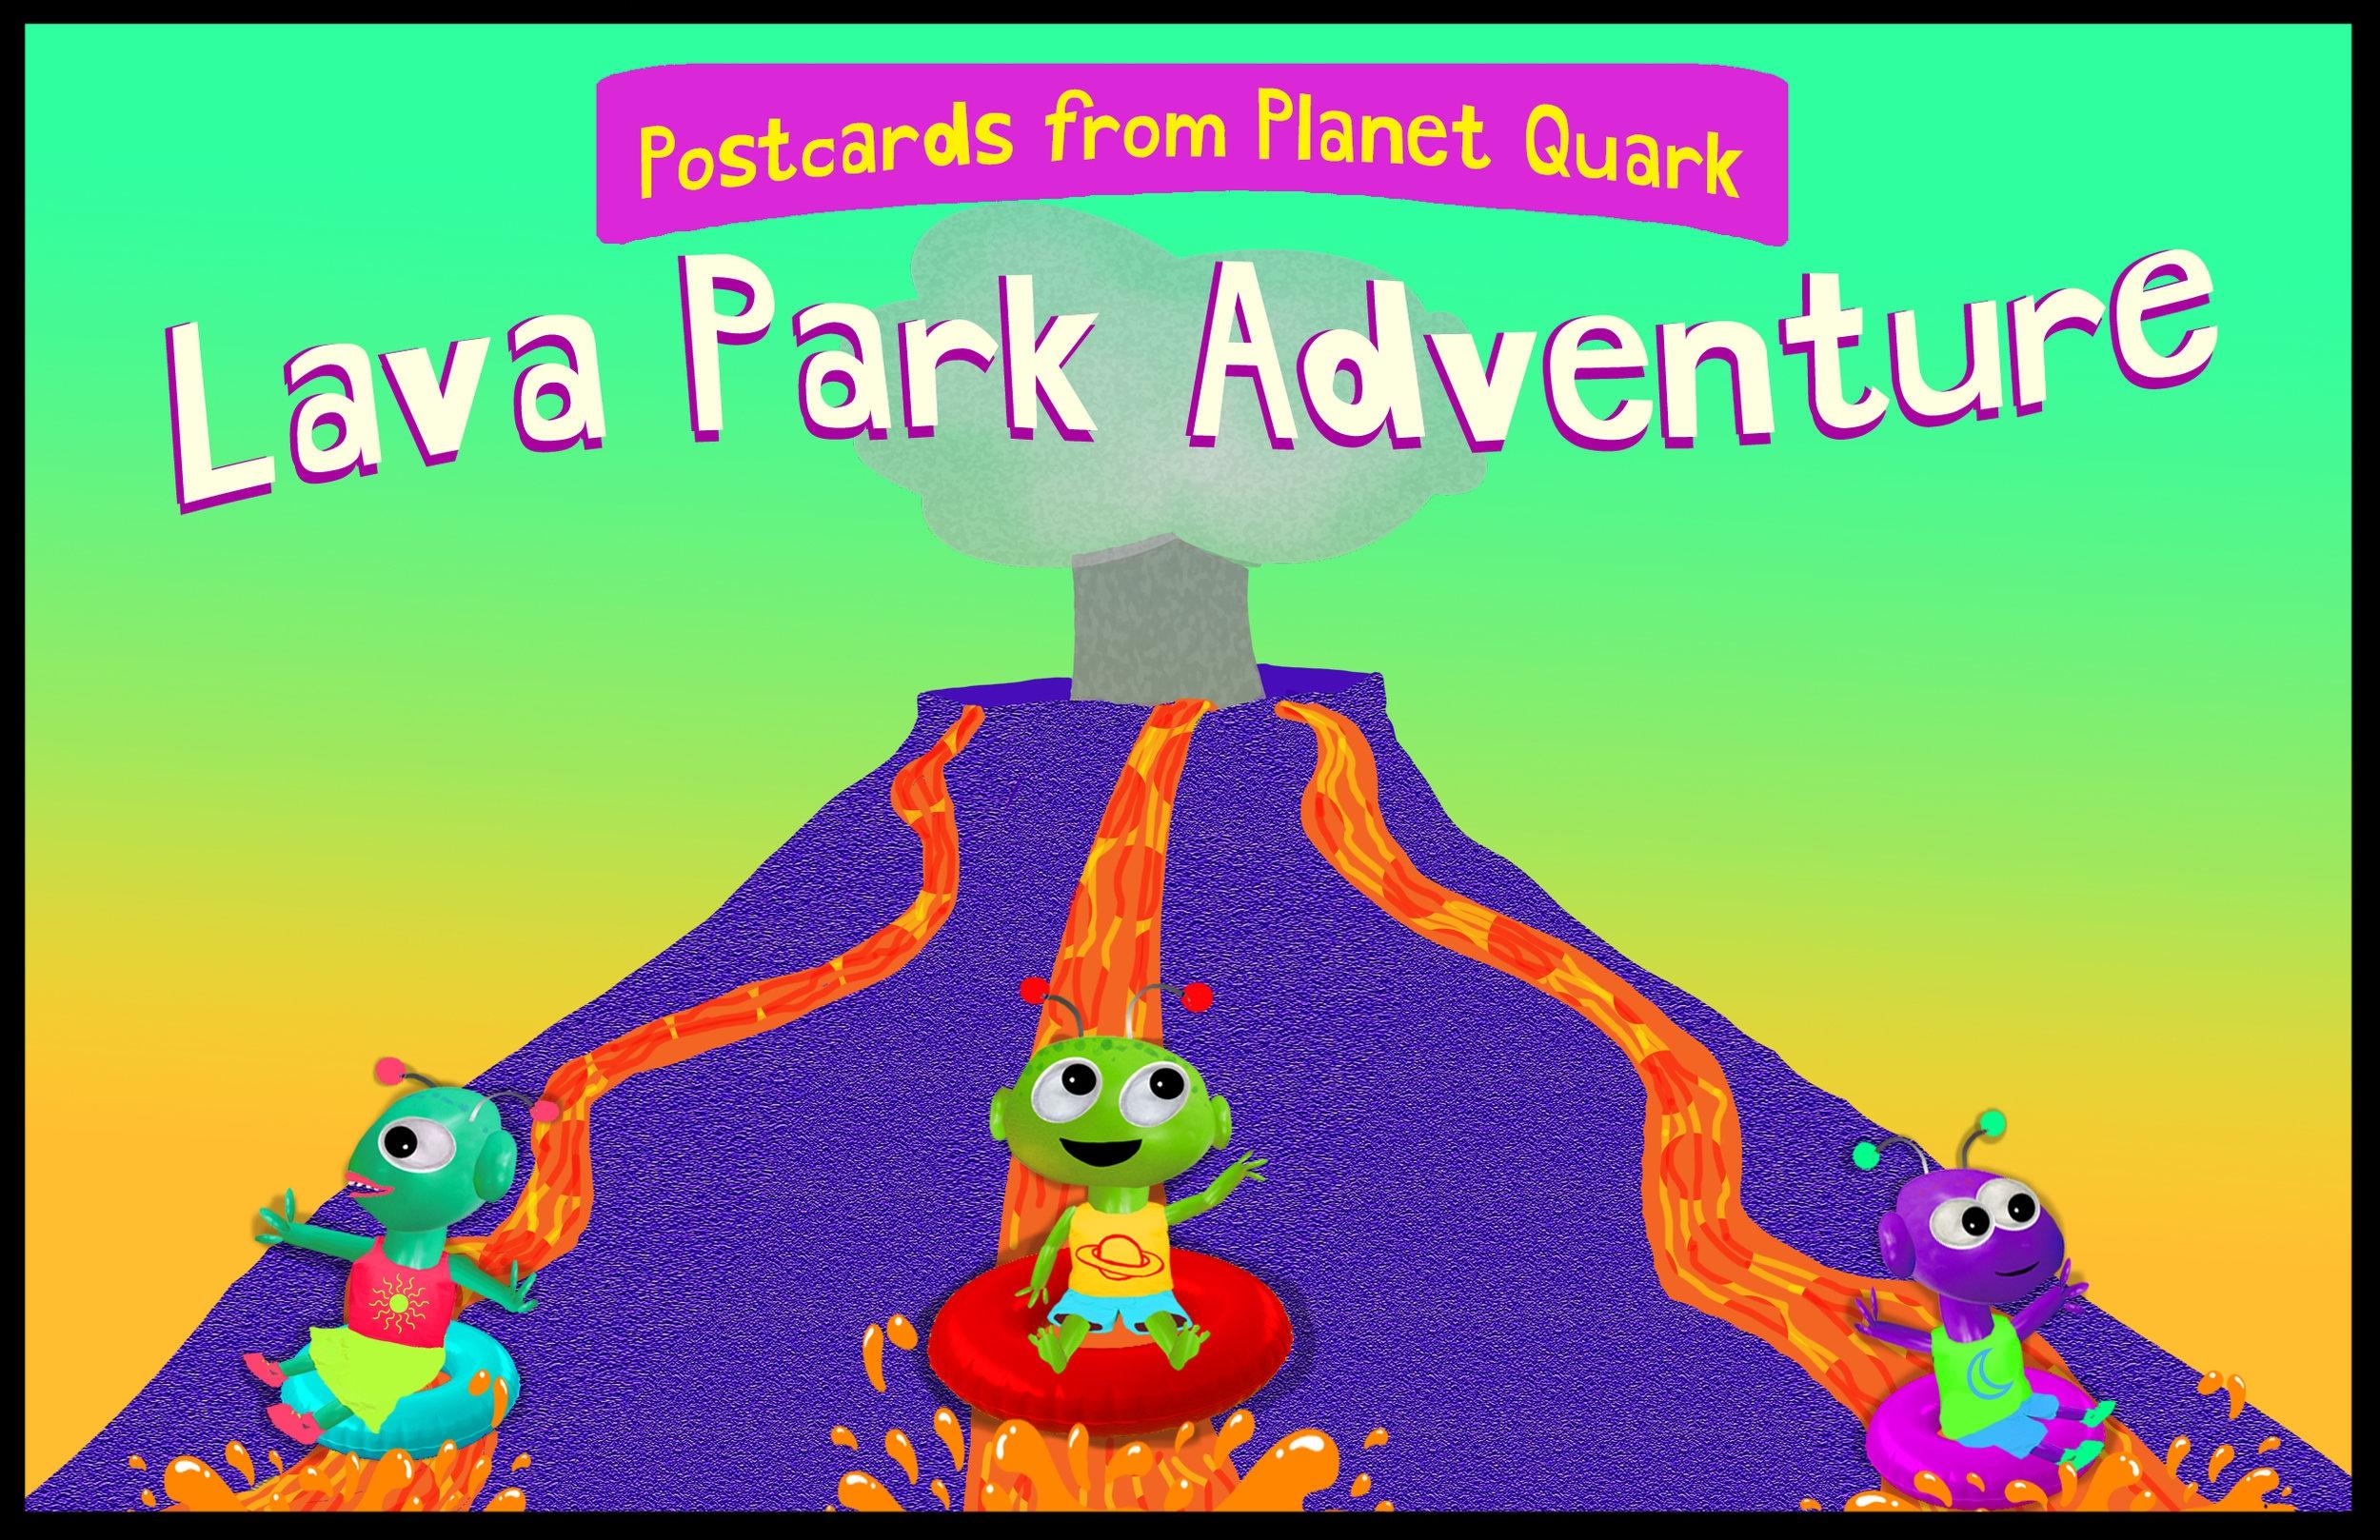 lava park adventure.jpg